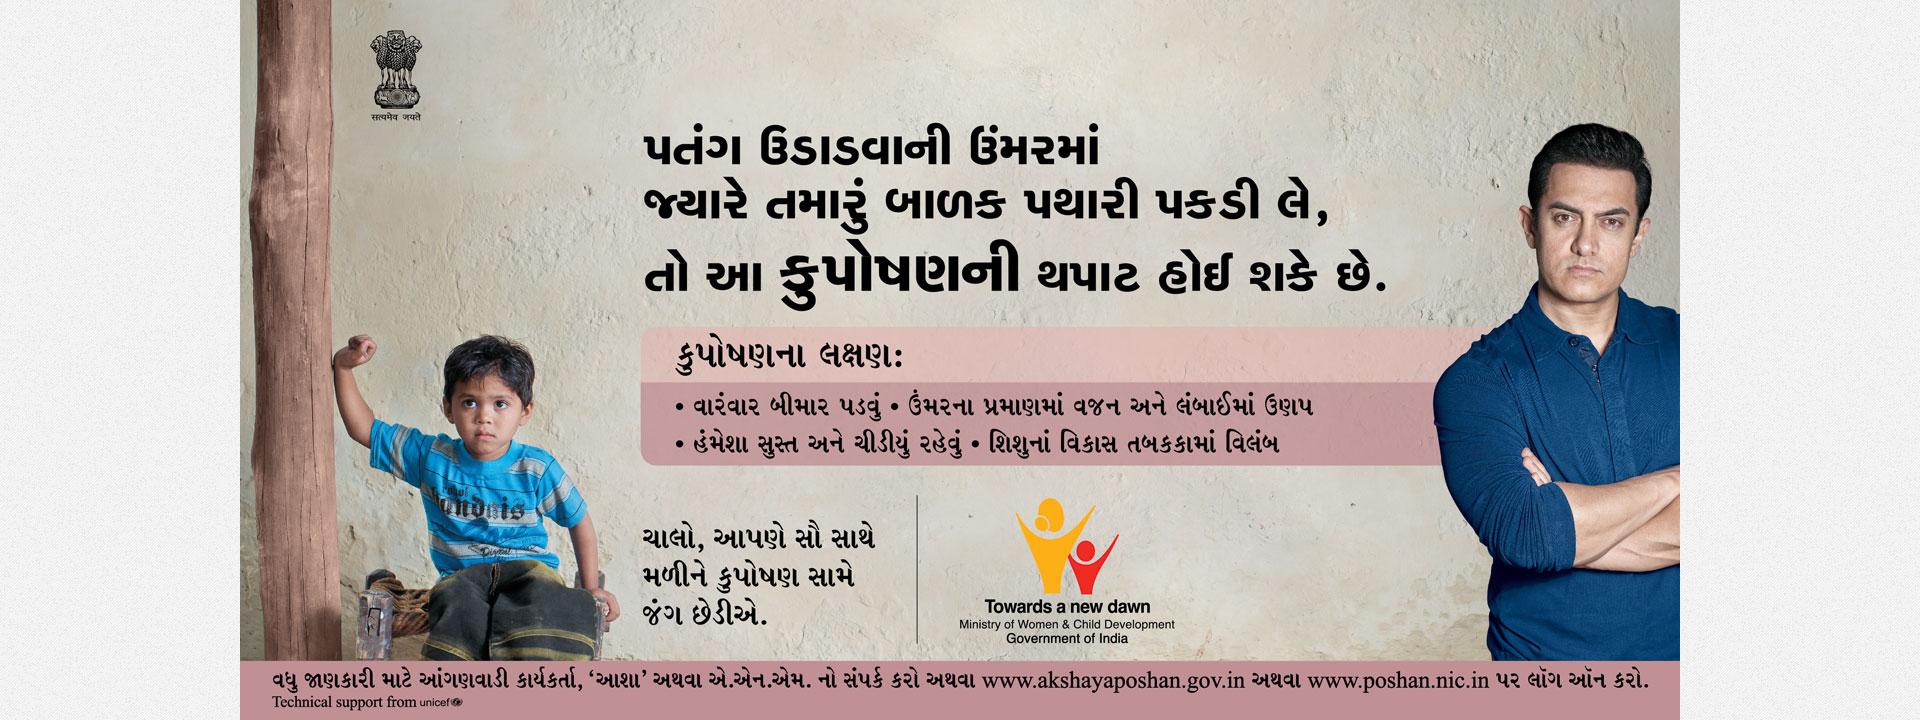 Gujarati - ગુજરાતી | Poshan | Nutrition, Food, Poverty